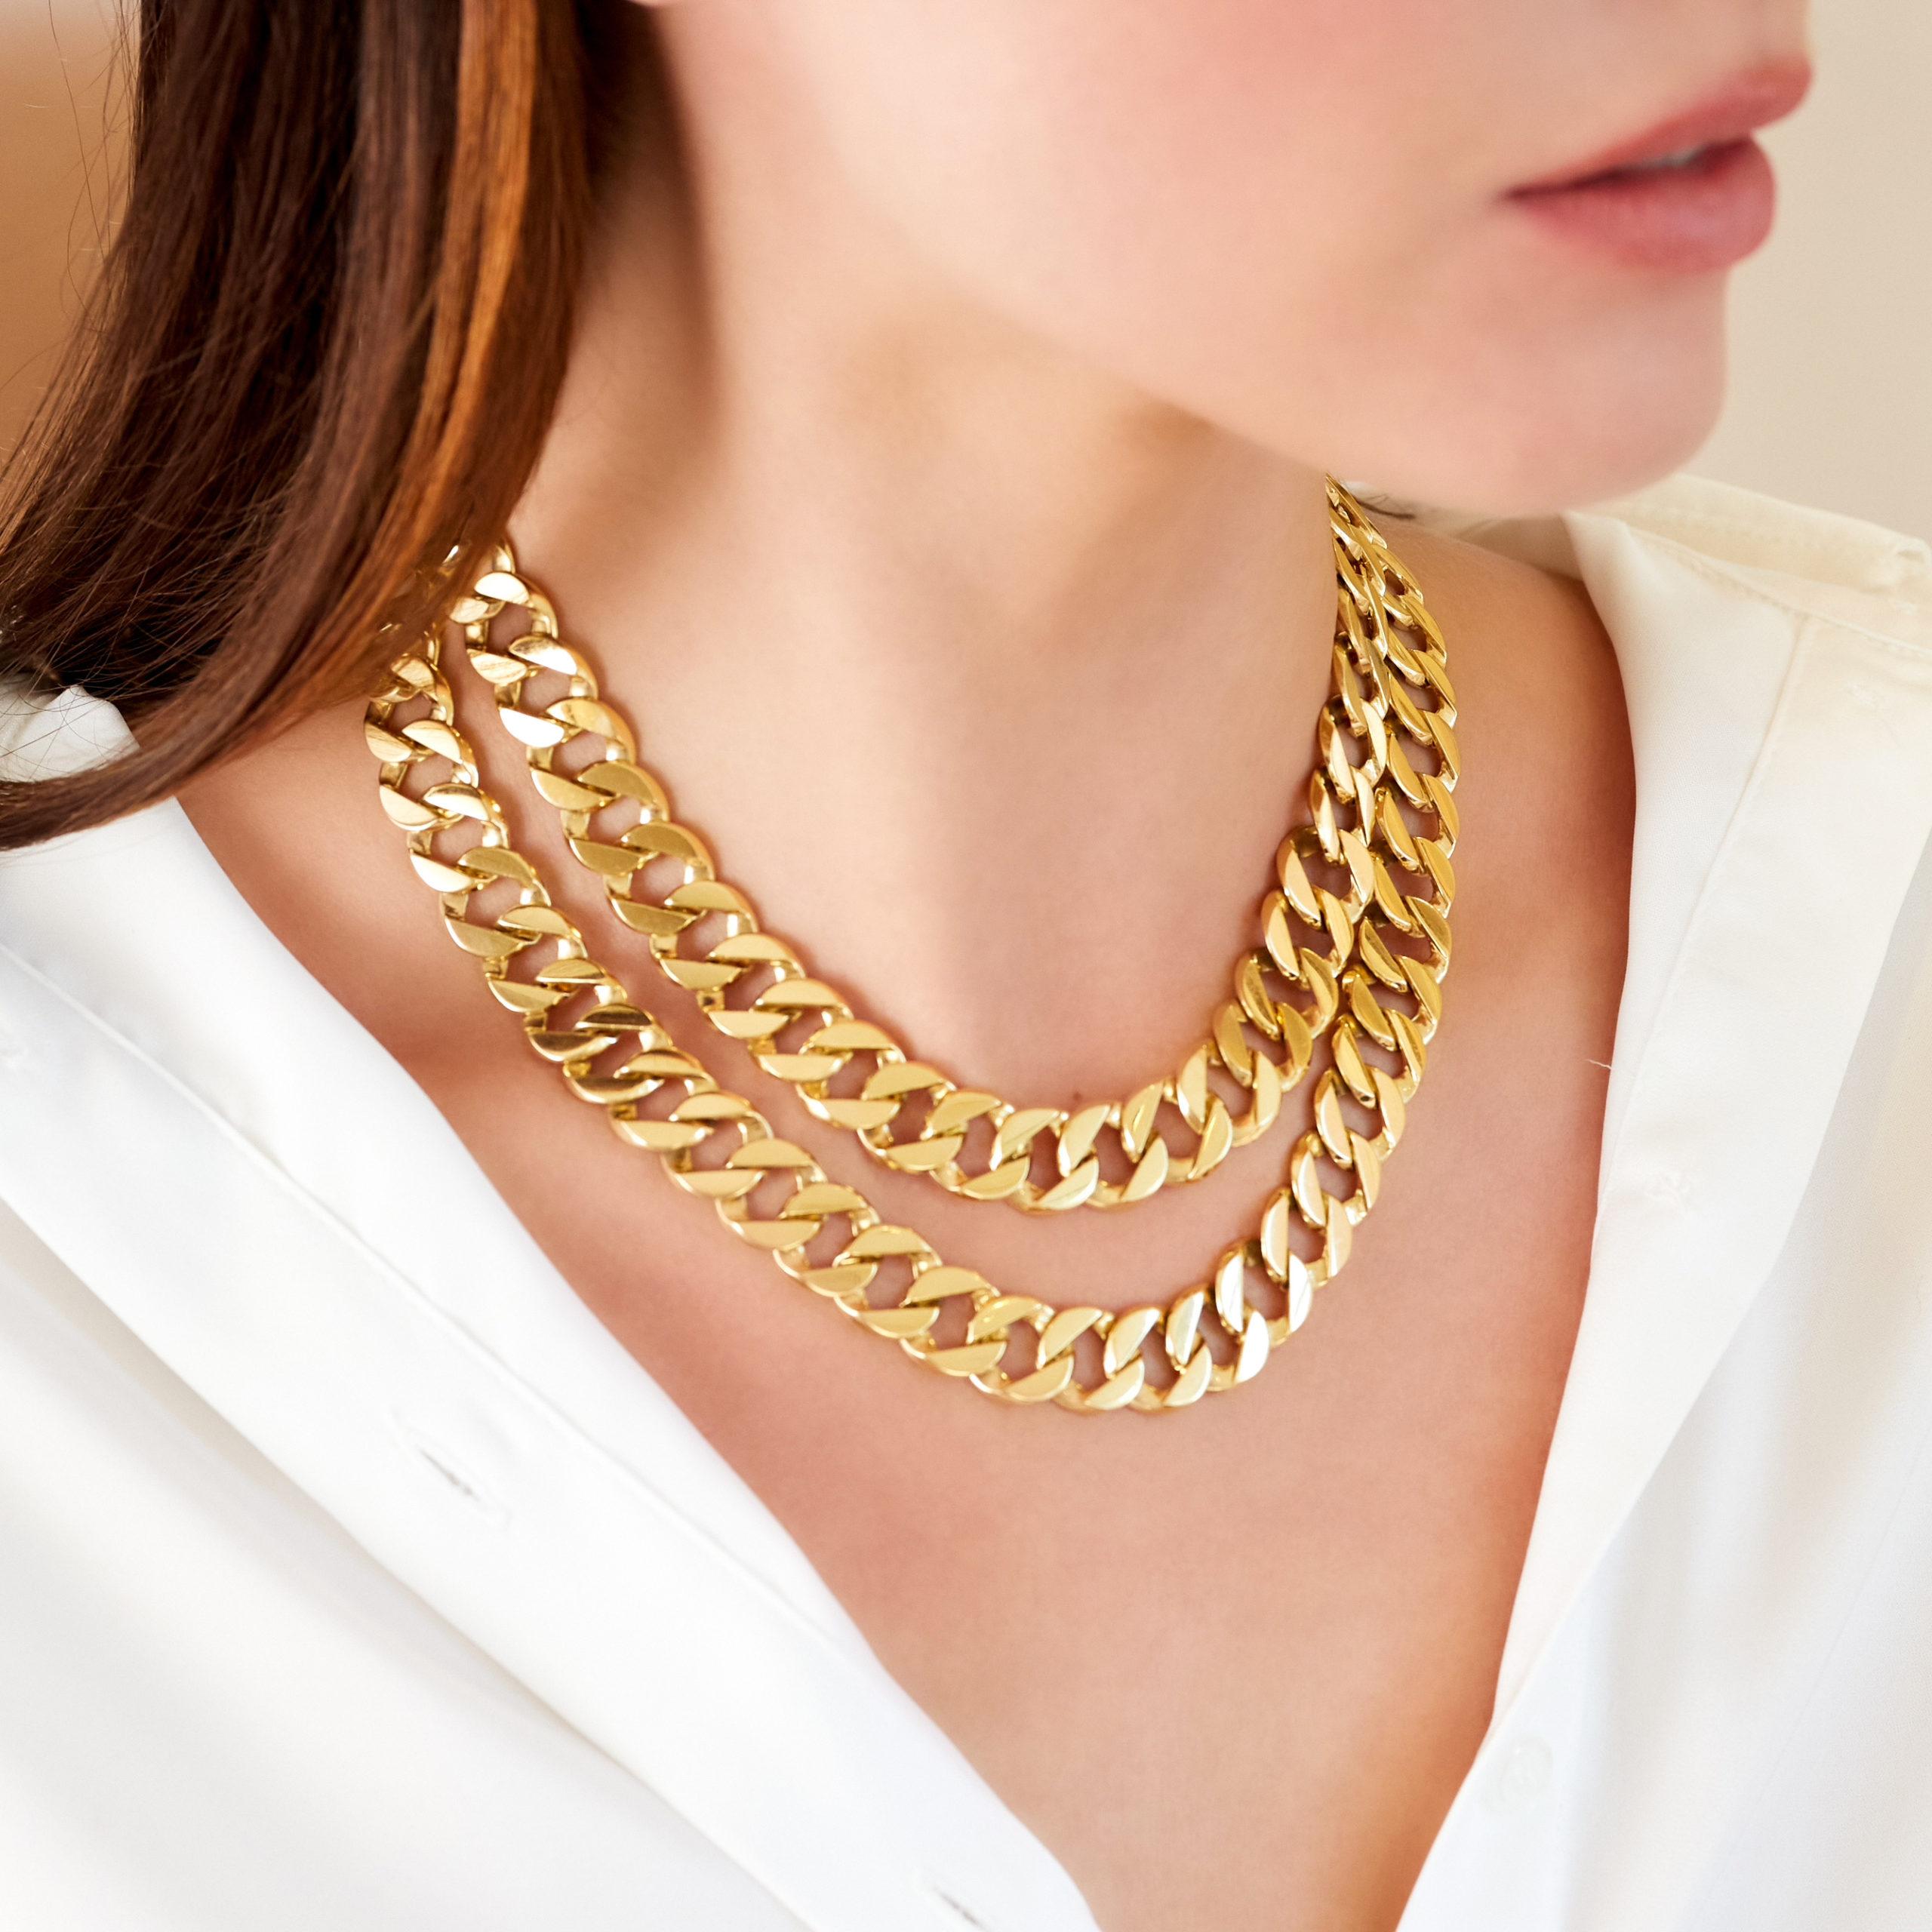 Double Wrap Curb-Link Necklace